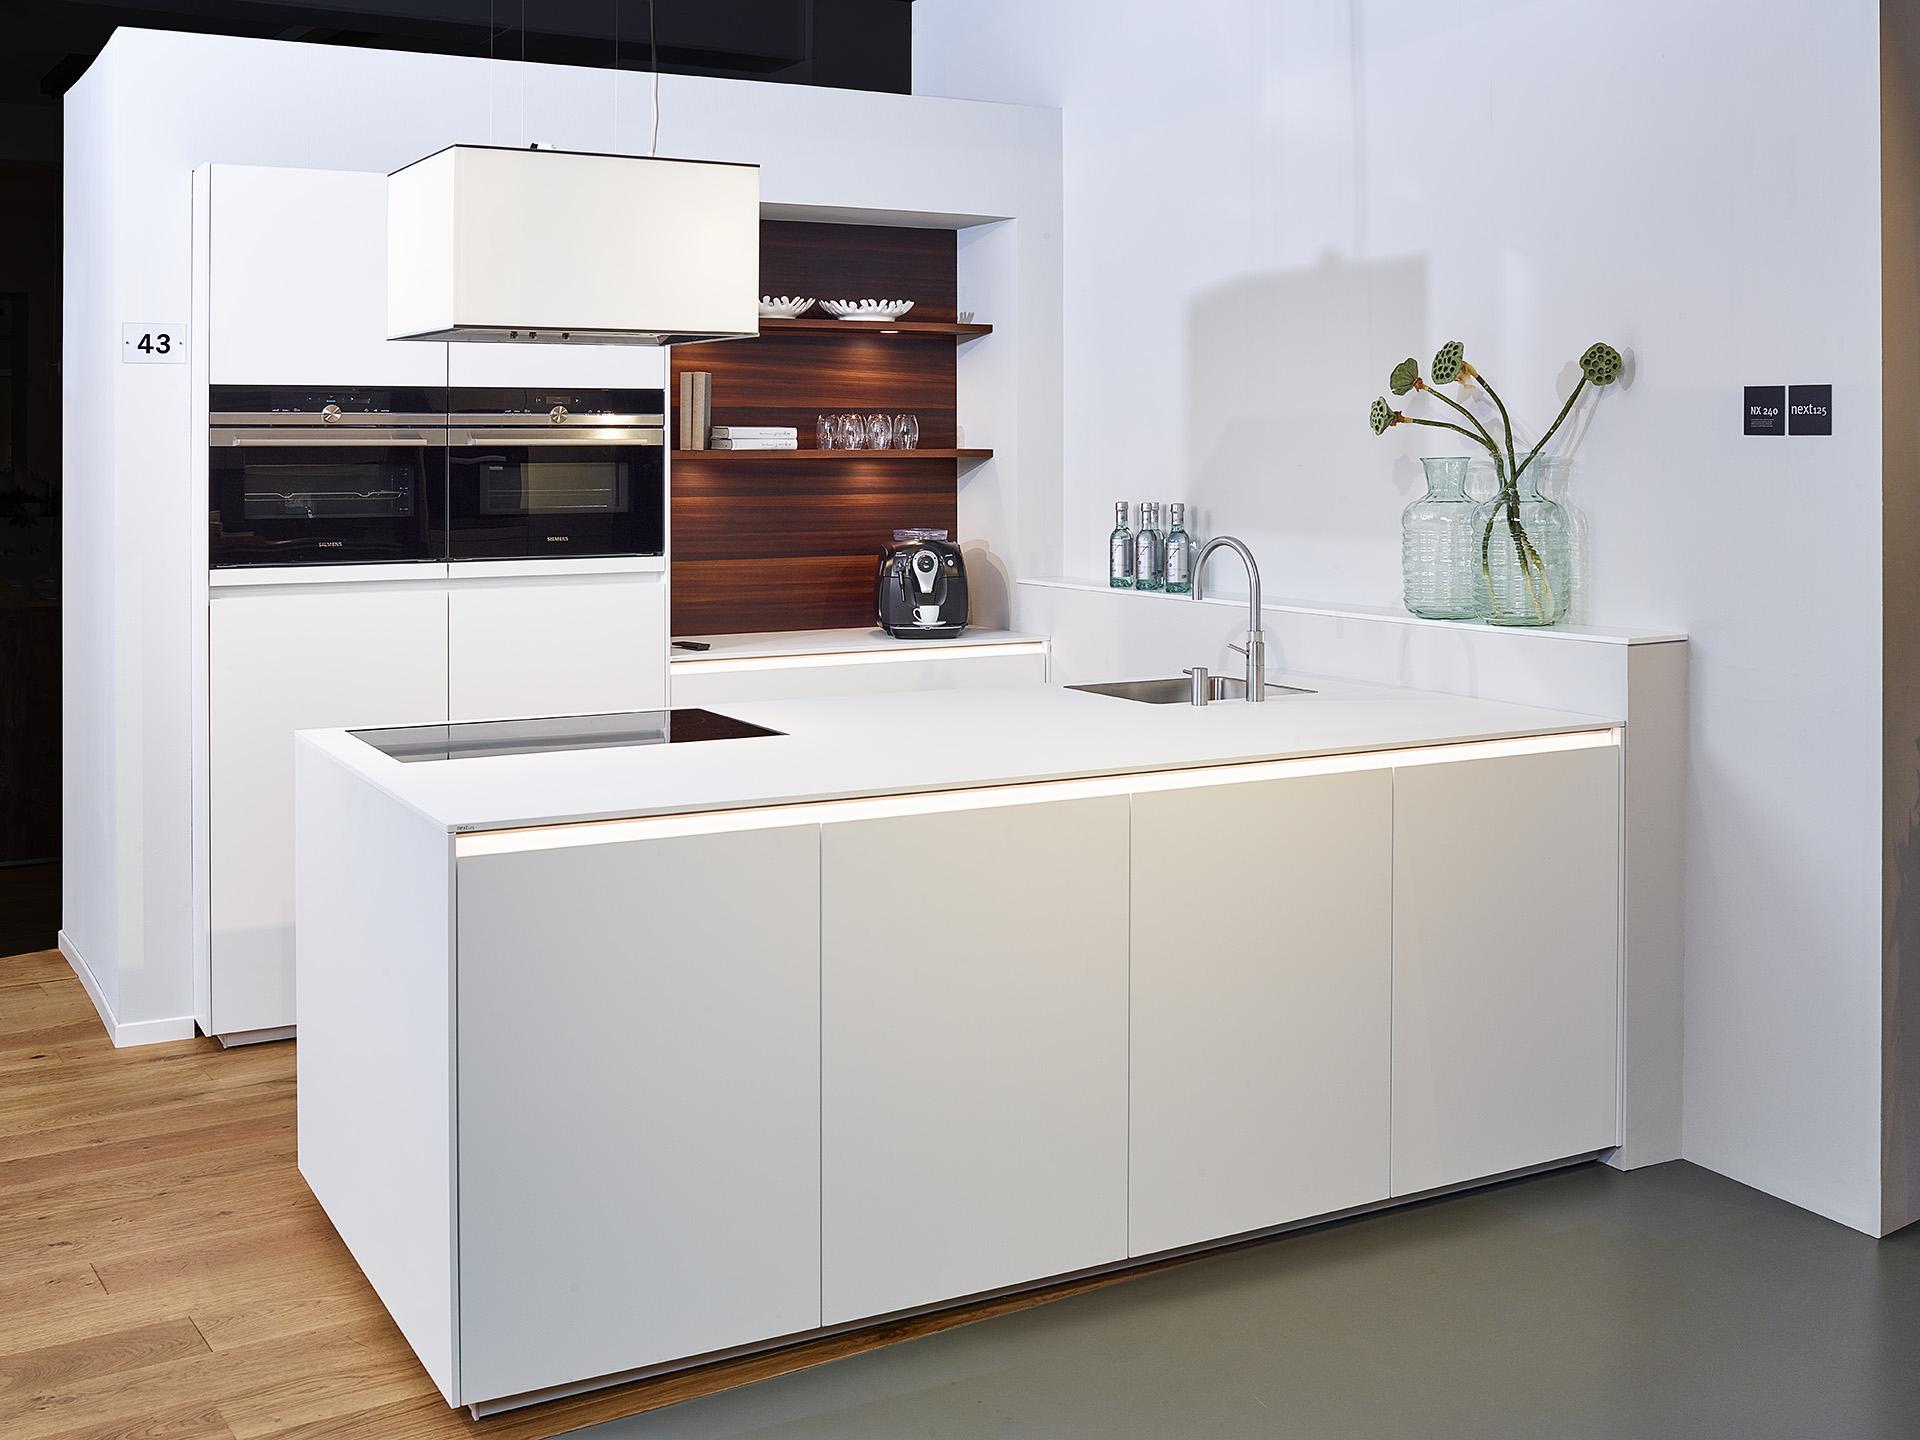 Full Size of Ekelhoff Küchenhaus Next125 Nx240 Fenix Feinmatt Koje 43 2019 01 07 Küche Einlegeböden Küche